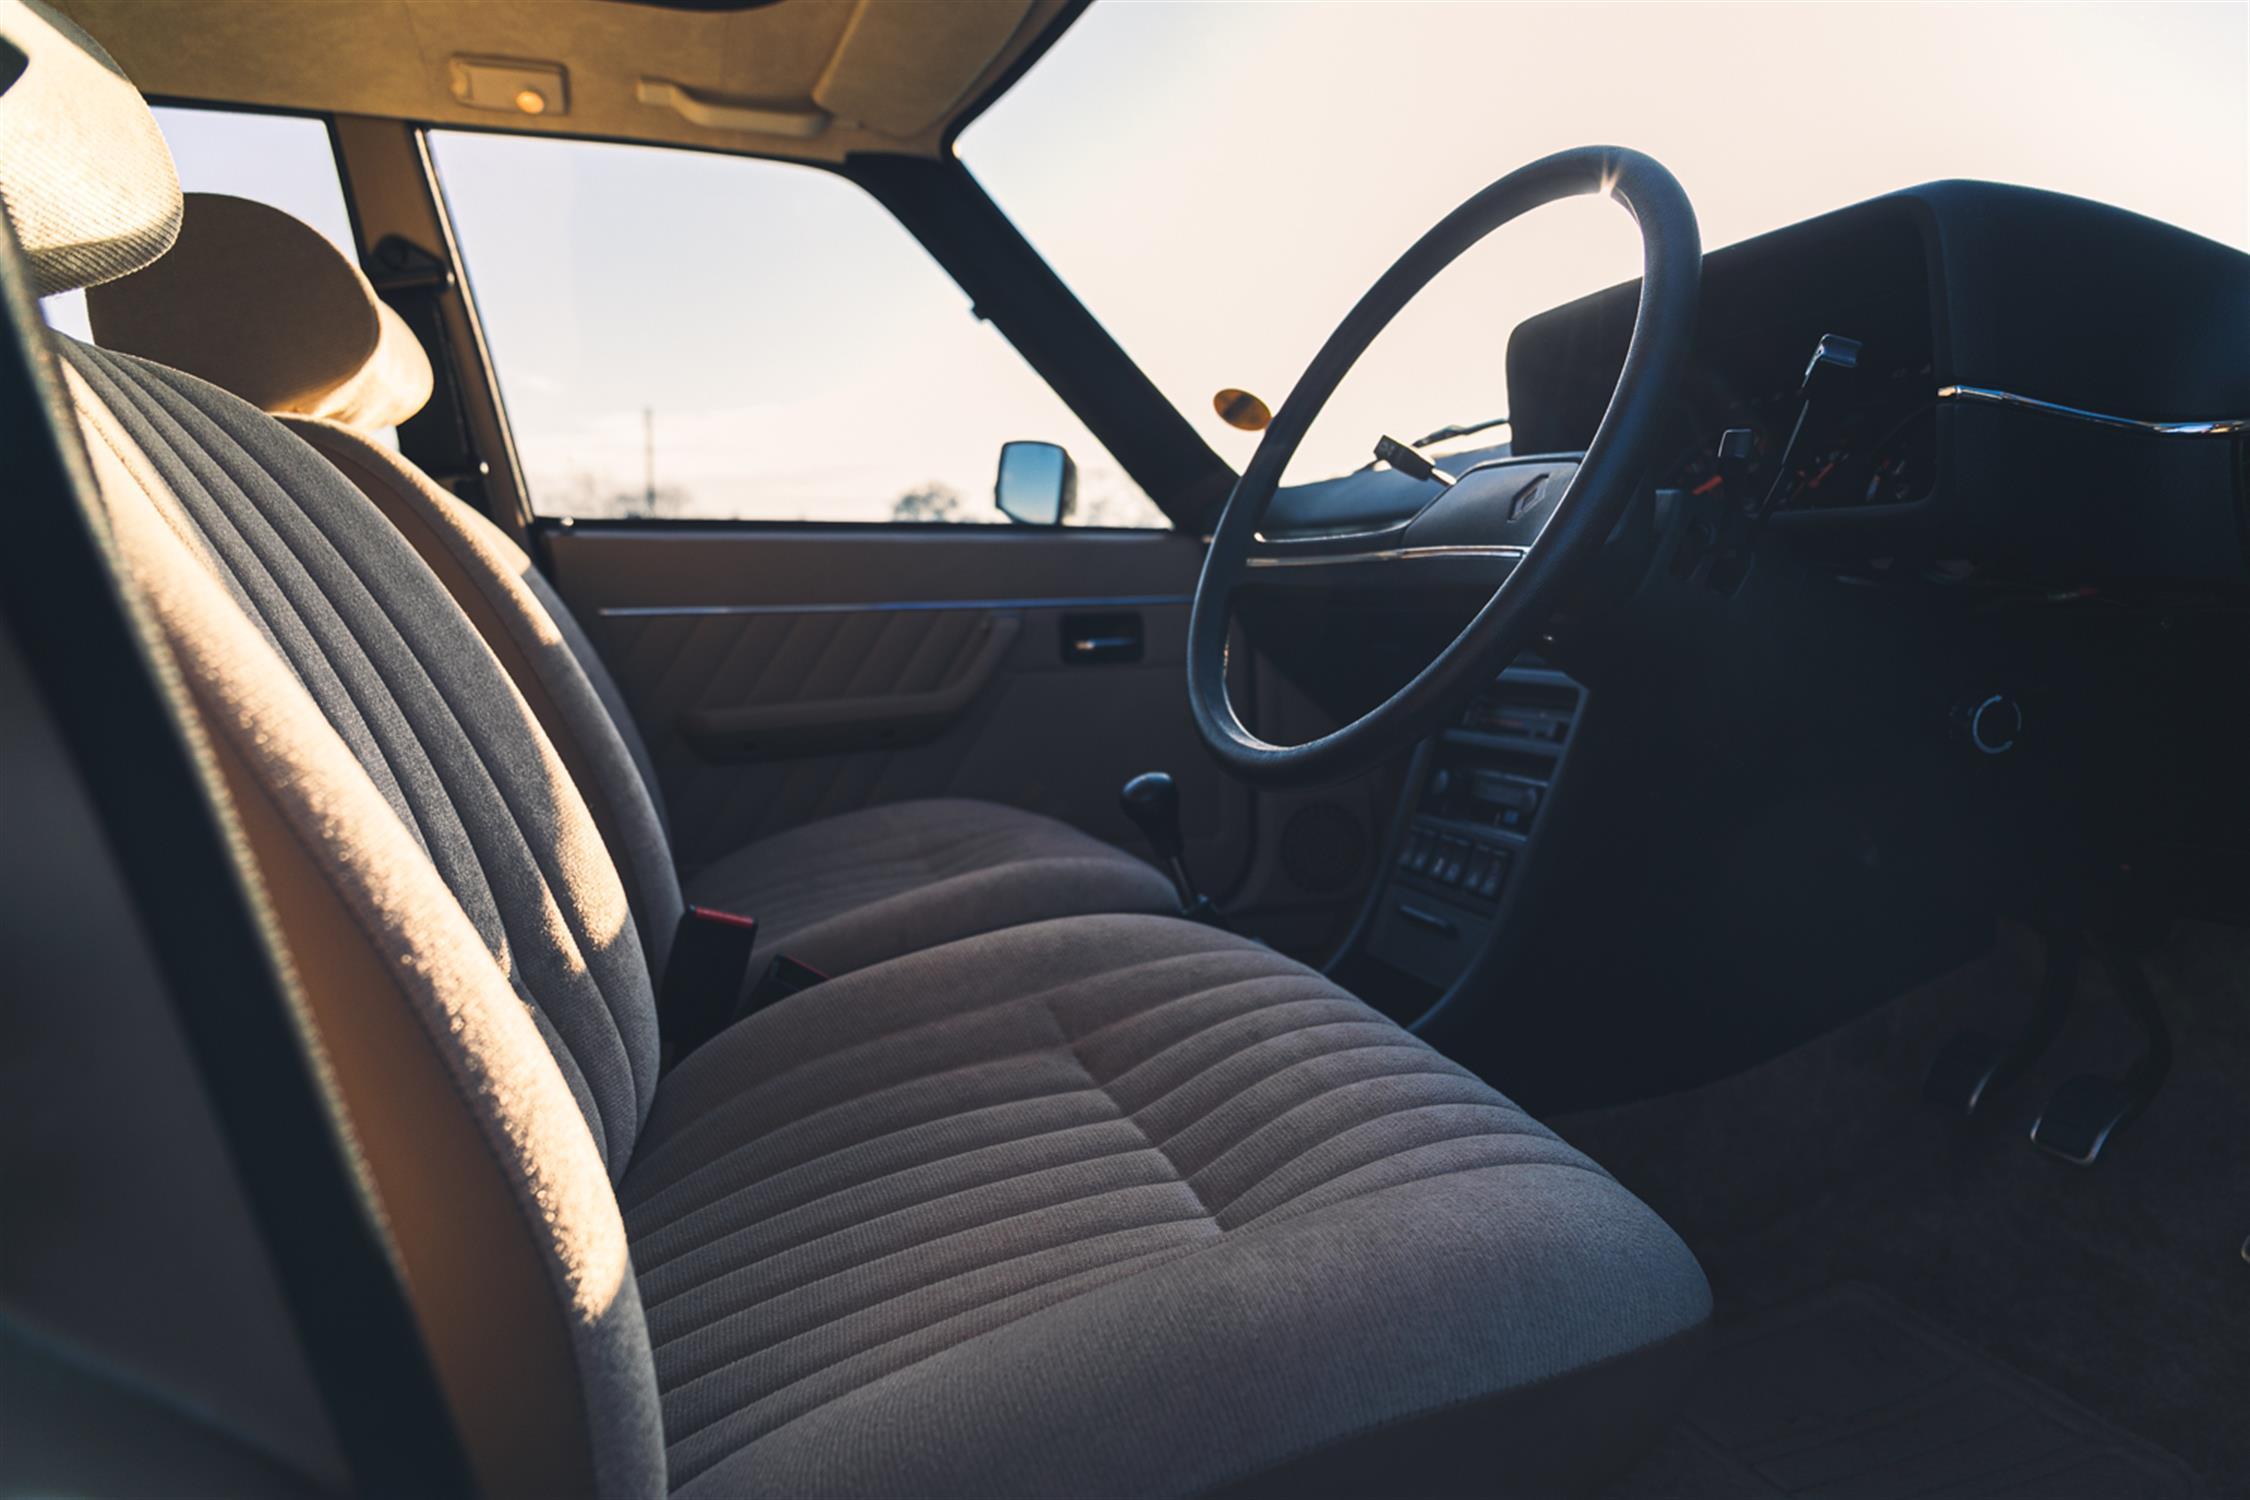 1983 Renault 18 GTL Estate - Image 4 of 32